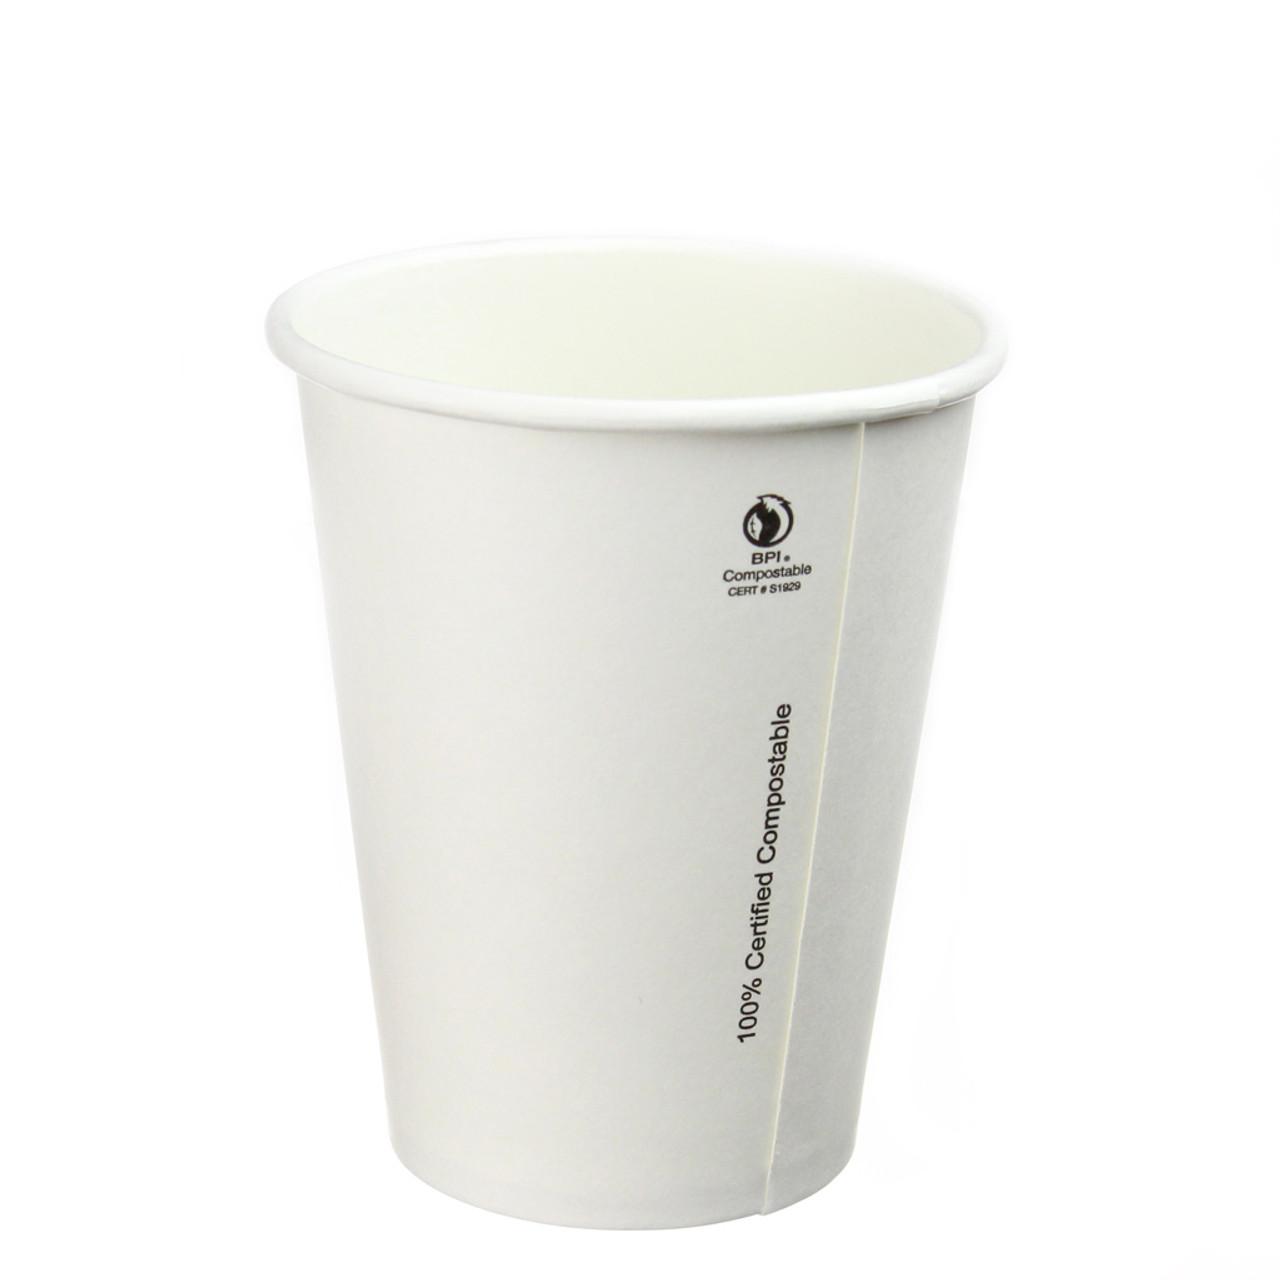 8oz Plain White Compostable Hot Cup